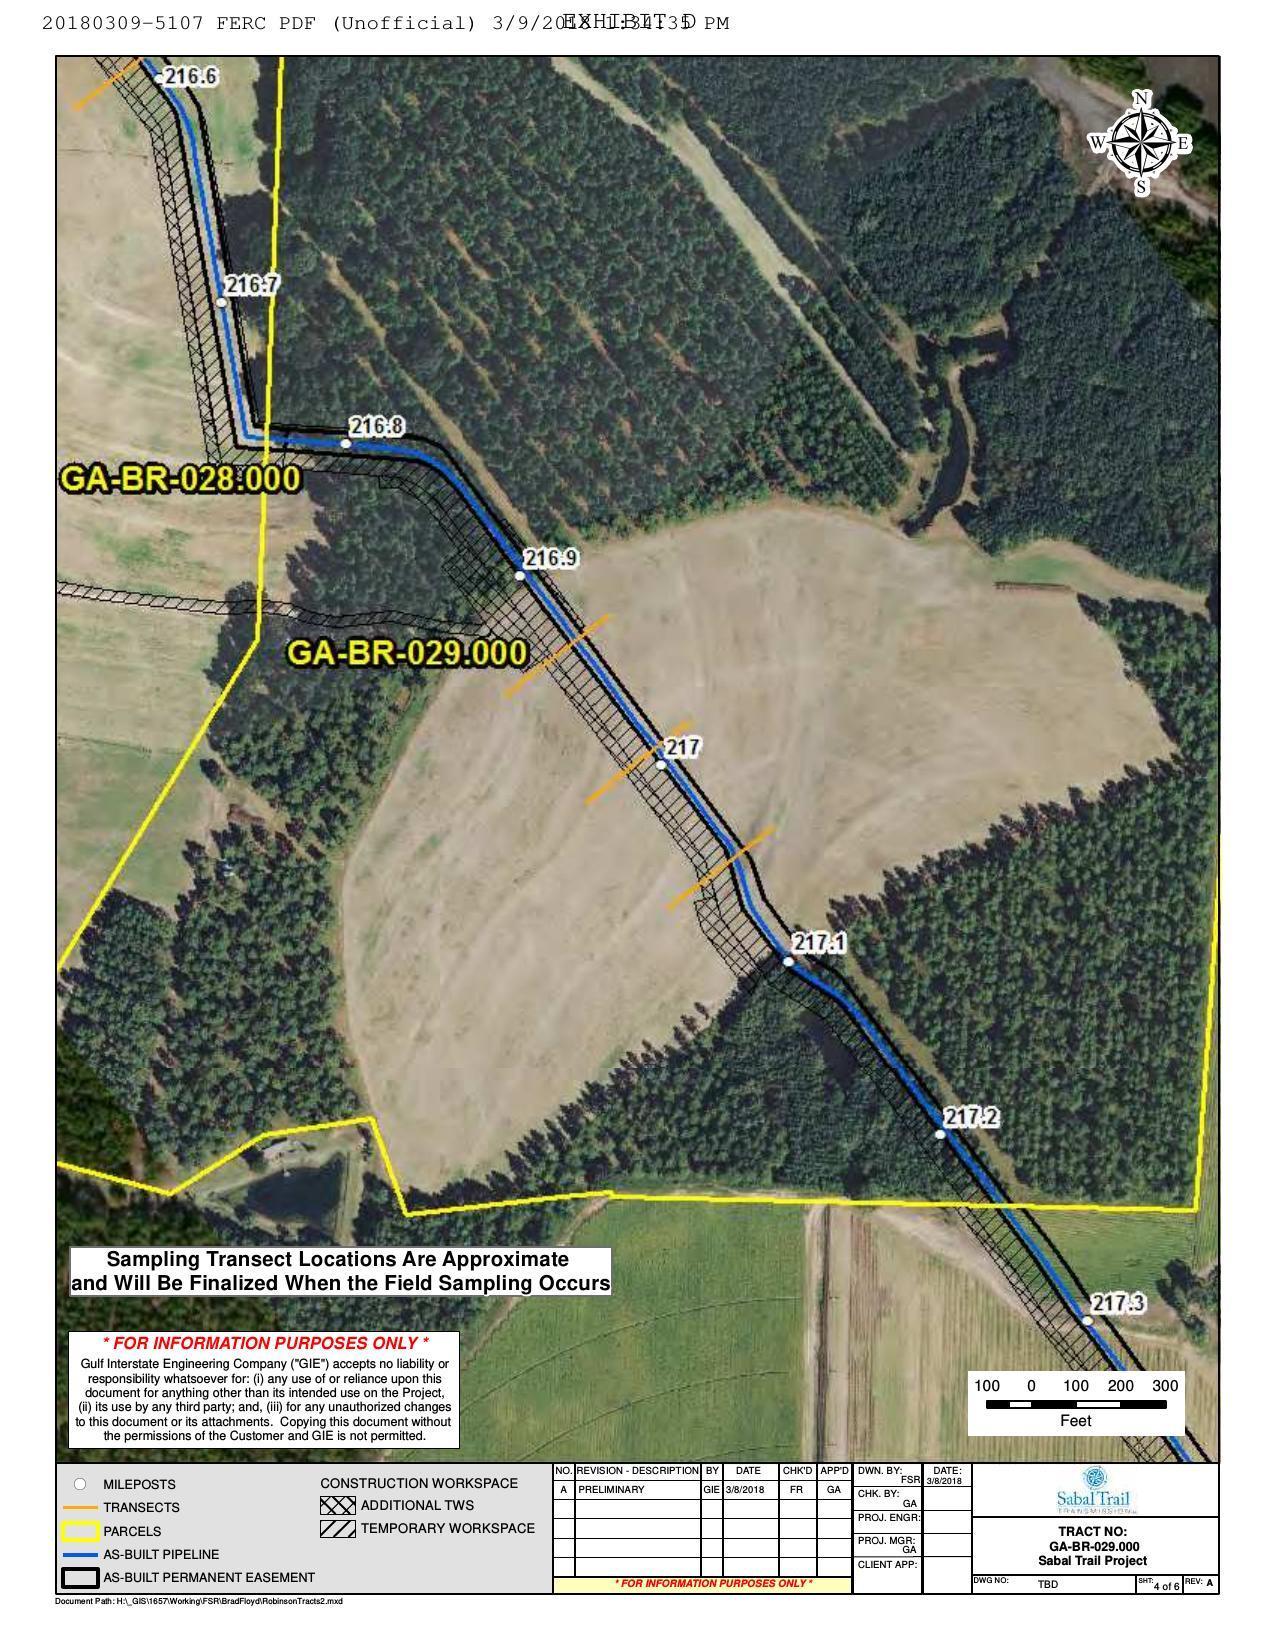 1275x1651 GA-BR-029.000 Dowdy south field, Little Creek, MP 217, 1657-PL-DG-70197-219, 30.94397, -83.61546, Dowdy parcel 053 00161 Brooks County, GA, in Sabal Trail alleged plan for soil mixing, by John S. Quarterman, 9 March 2018